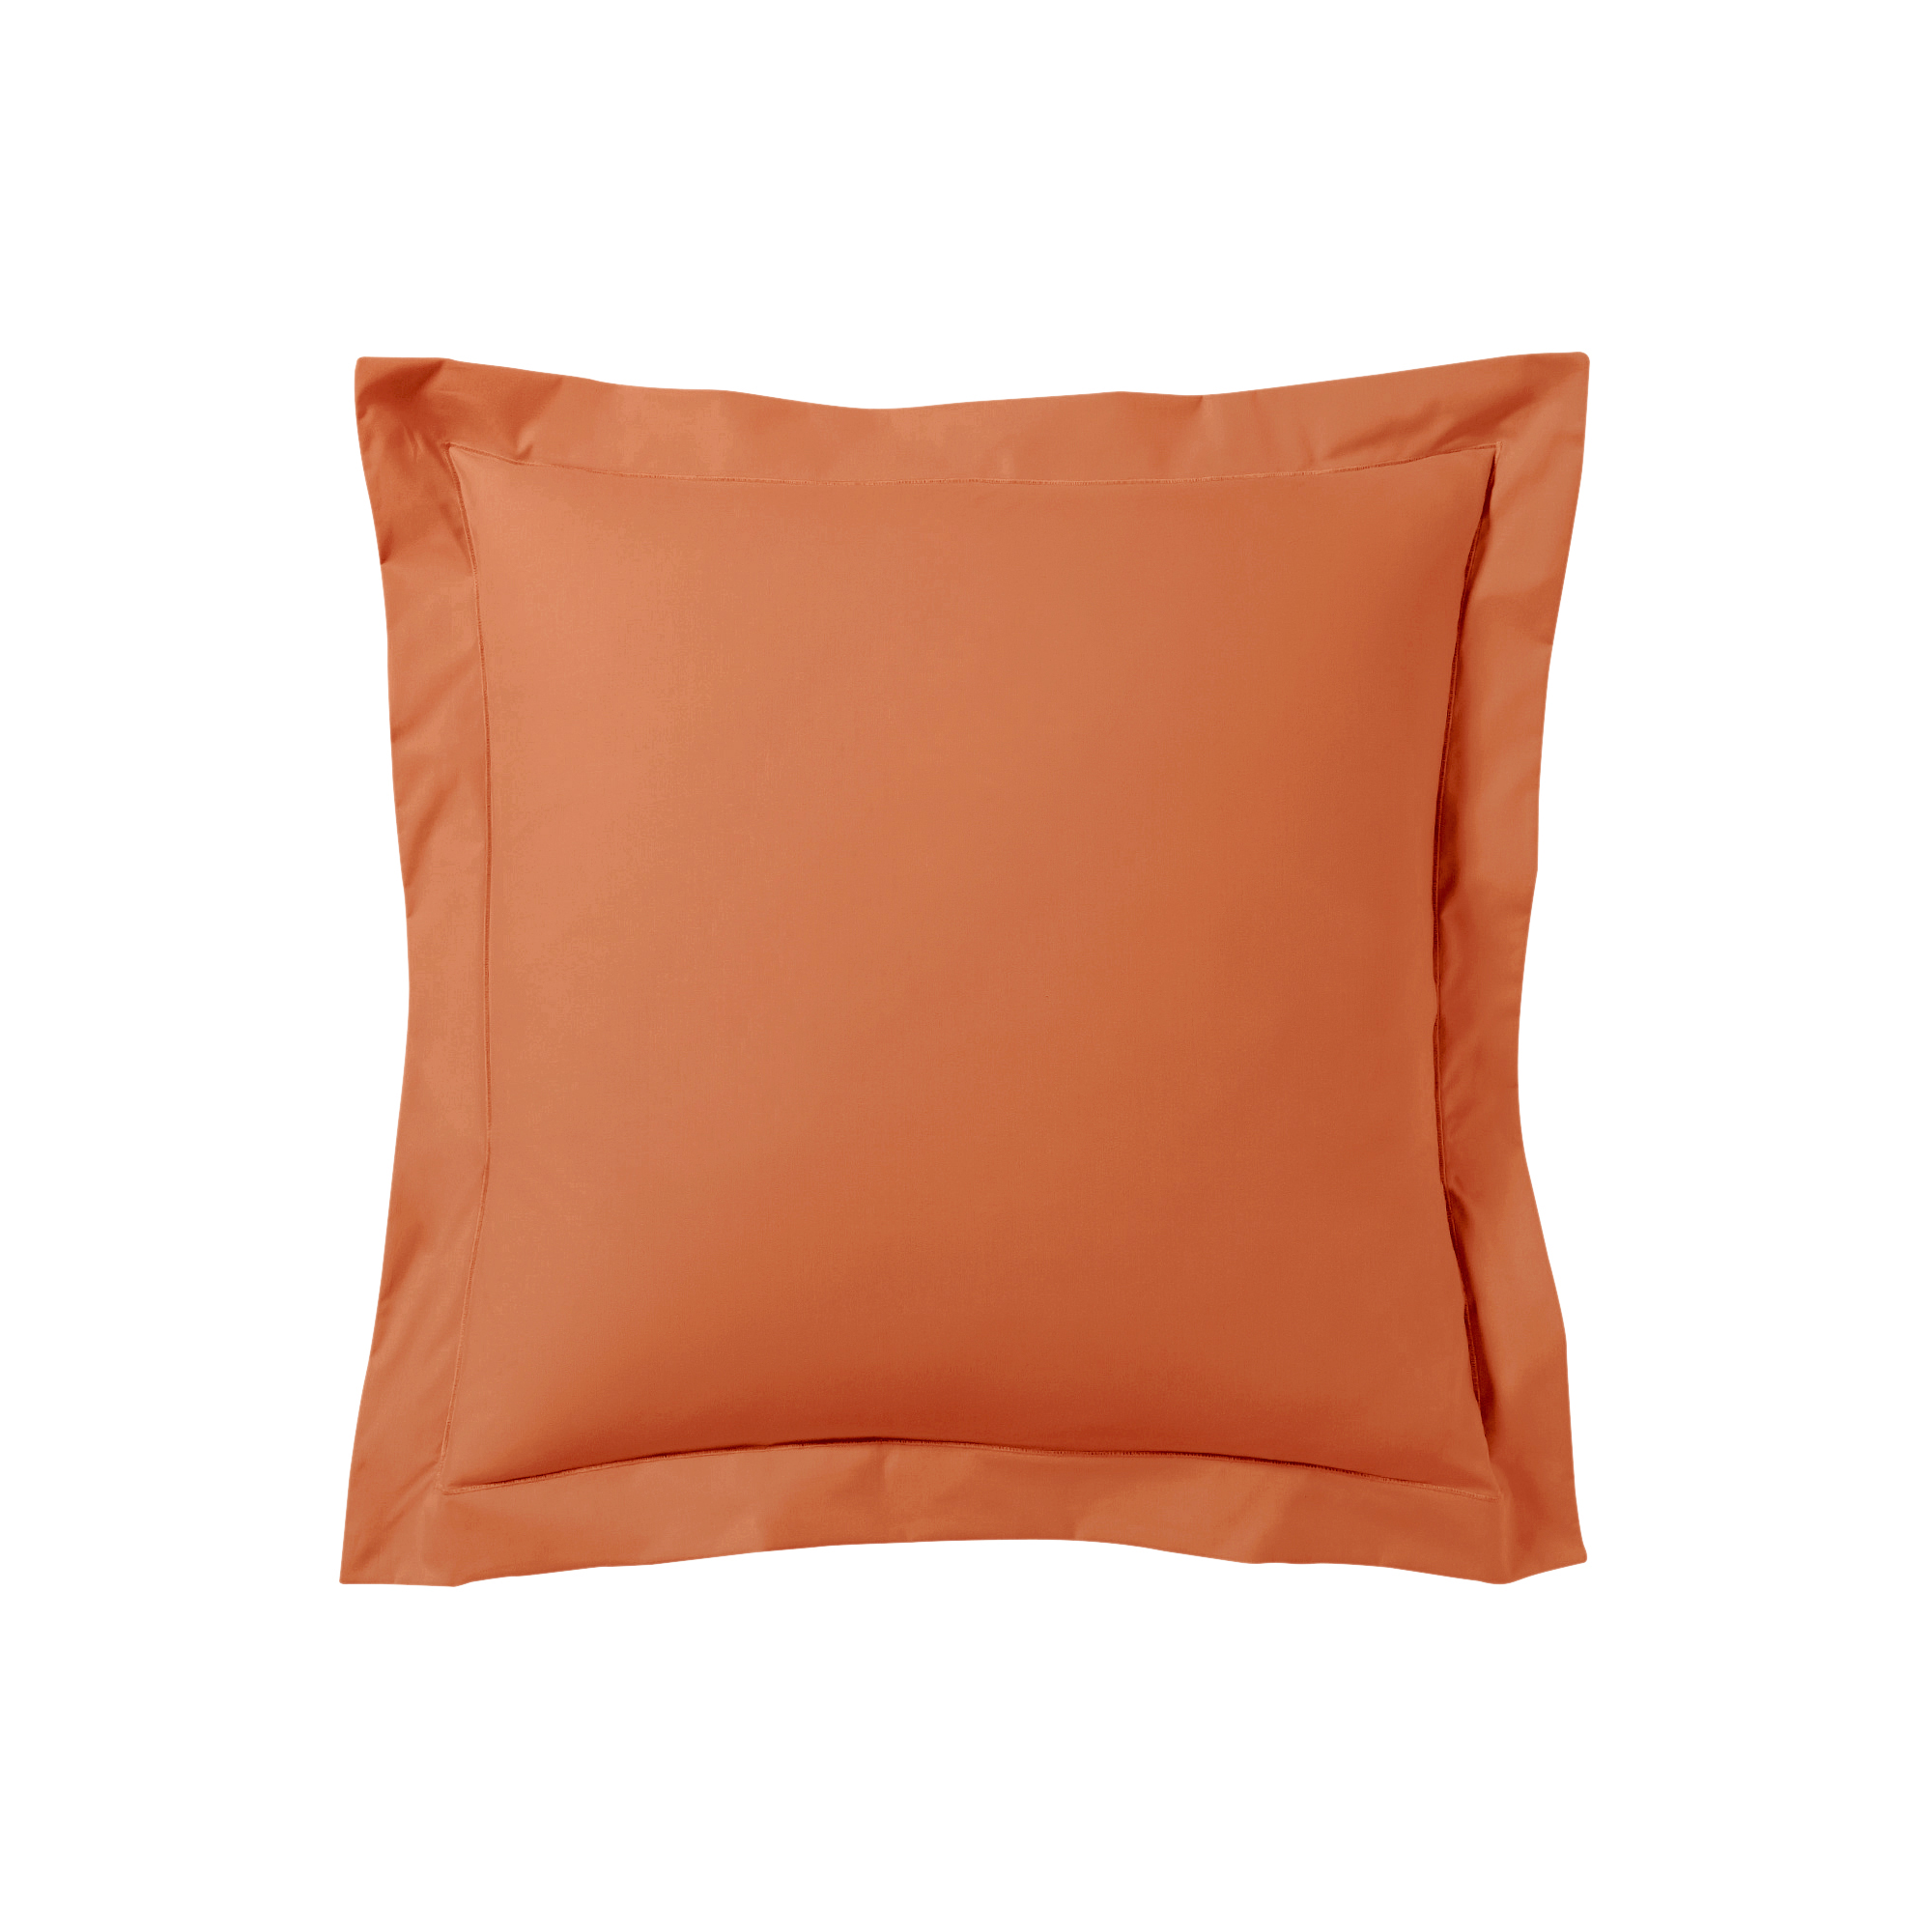 Taie d'oreiller unie en percale de coton orange 65x65